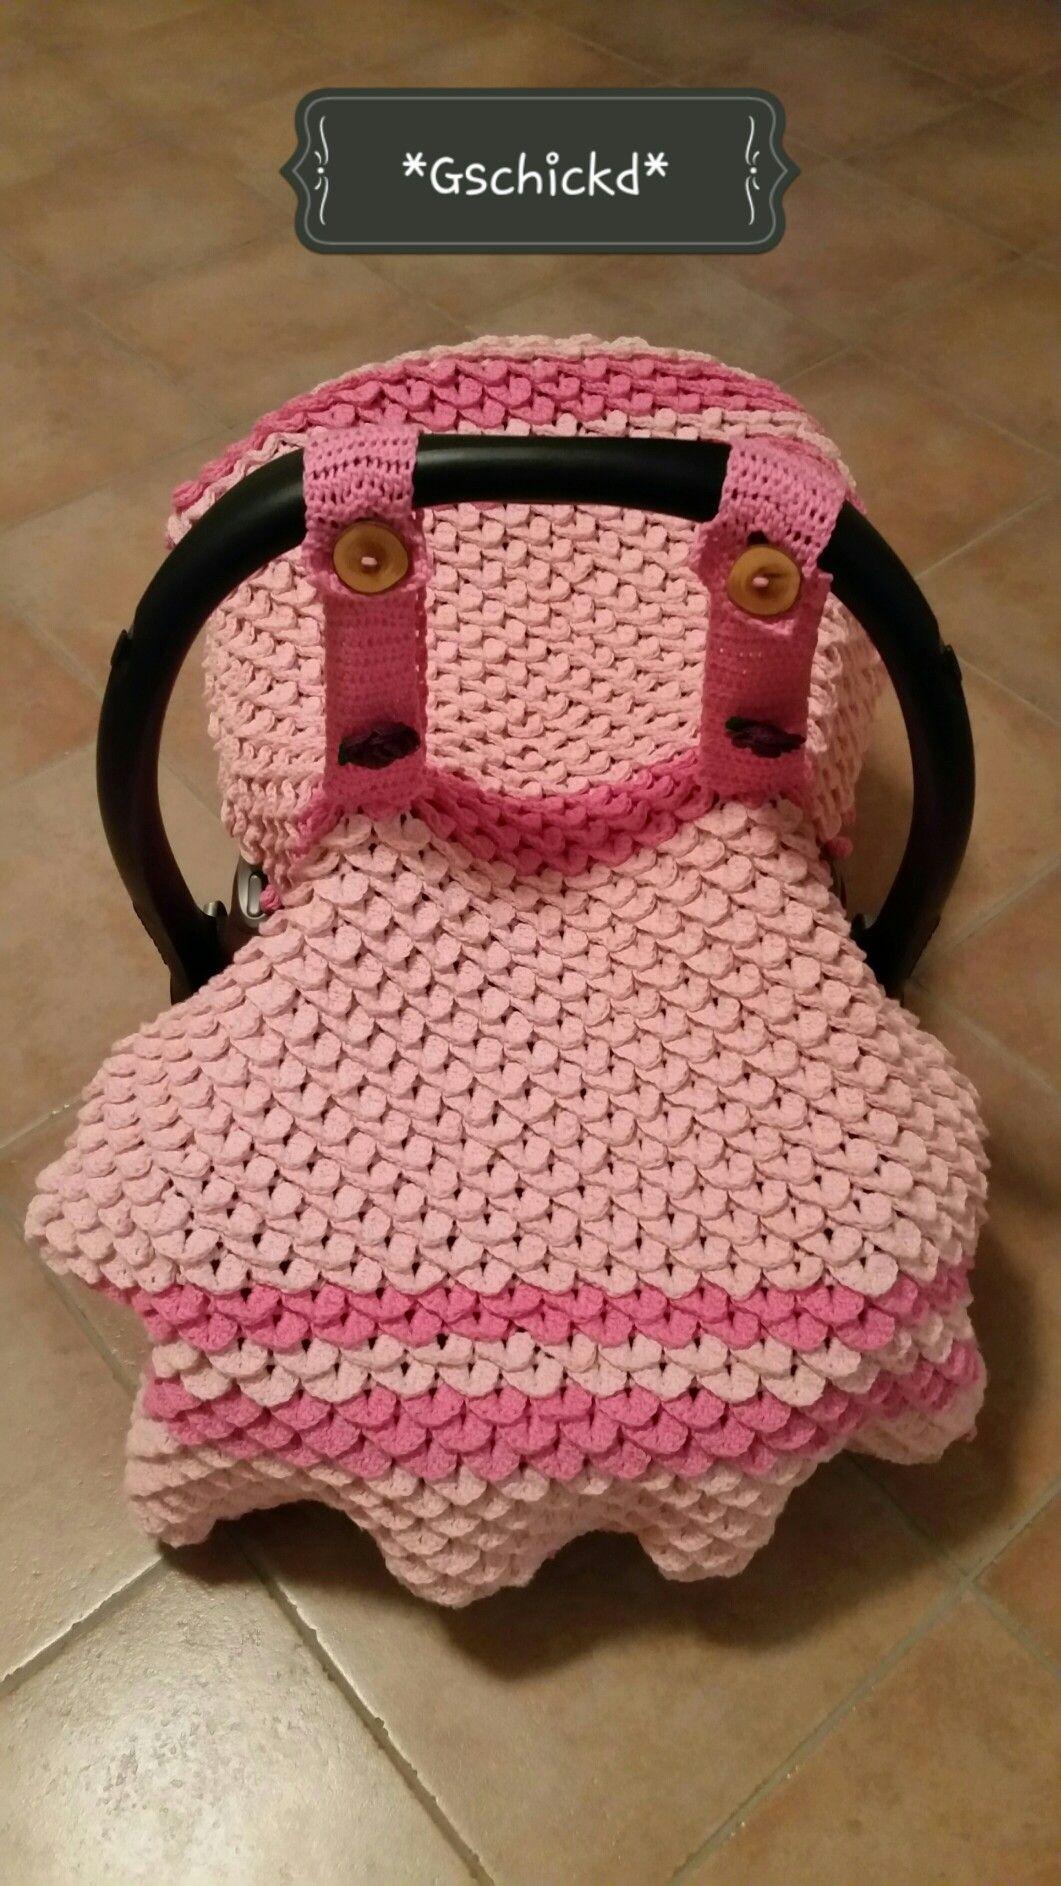 Babydecke passend zum MaxiCosi mit Crocodile Stitch Muster | baby ...